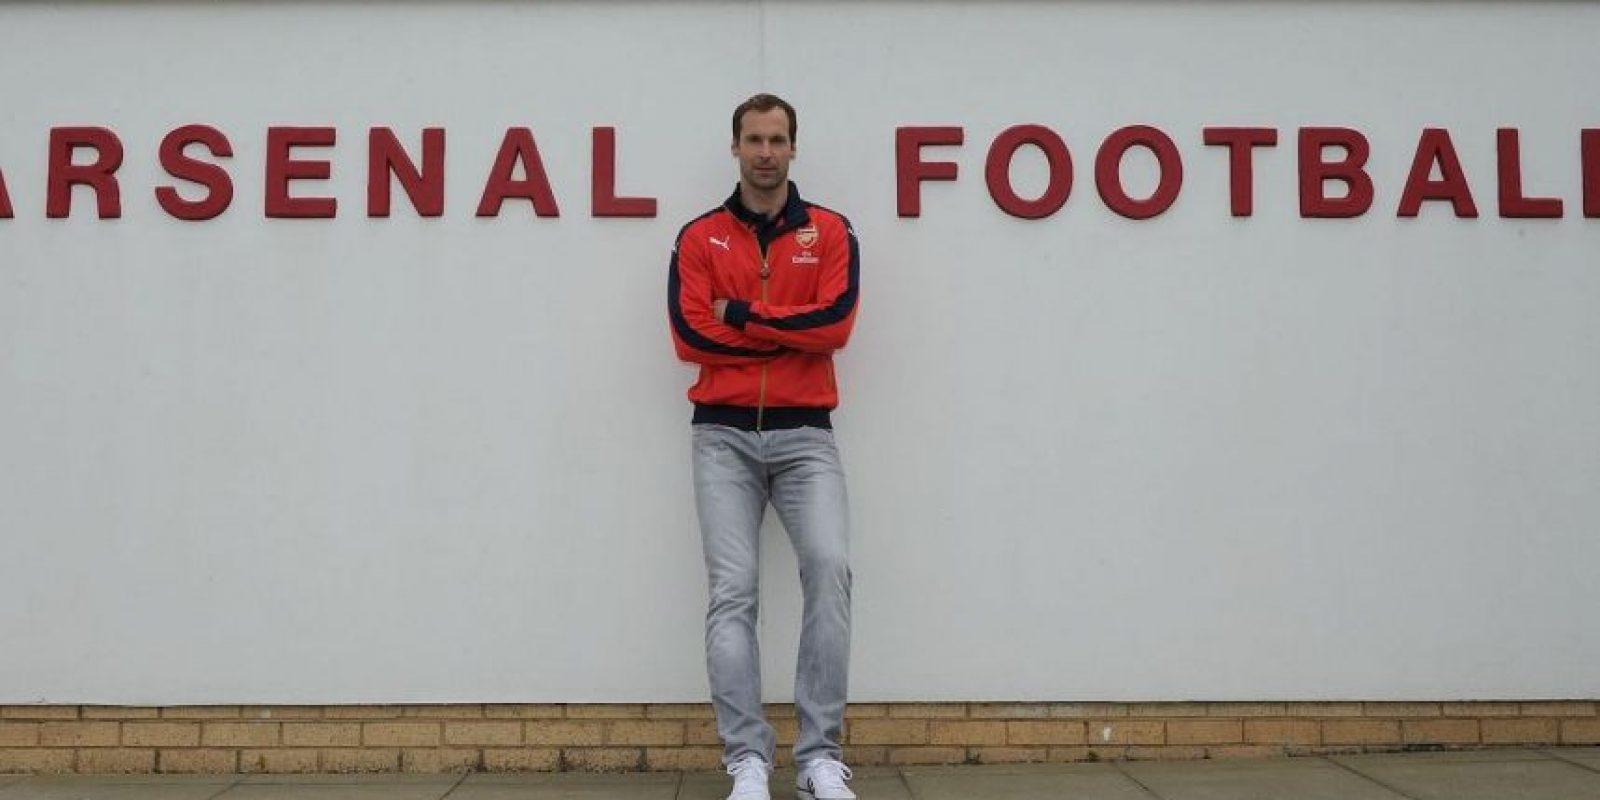 El arquero salió de Chelsea rumbo al Arsenal de Londres. Foto:Vía facebook.com/PetrCech.official